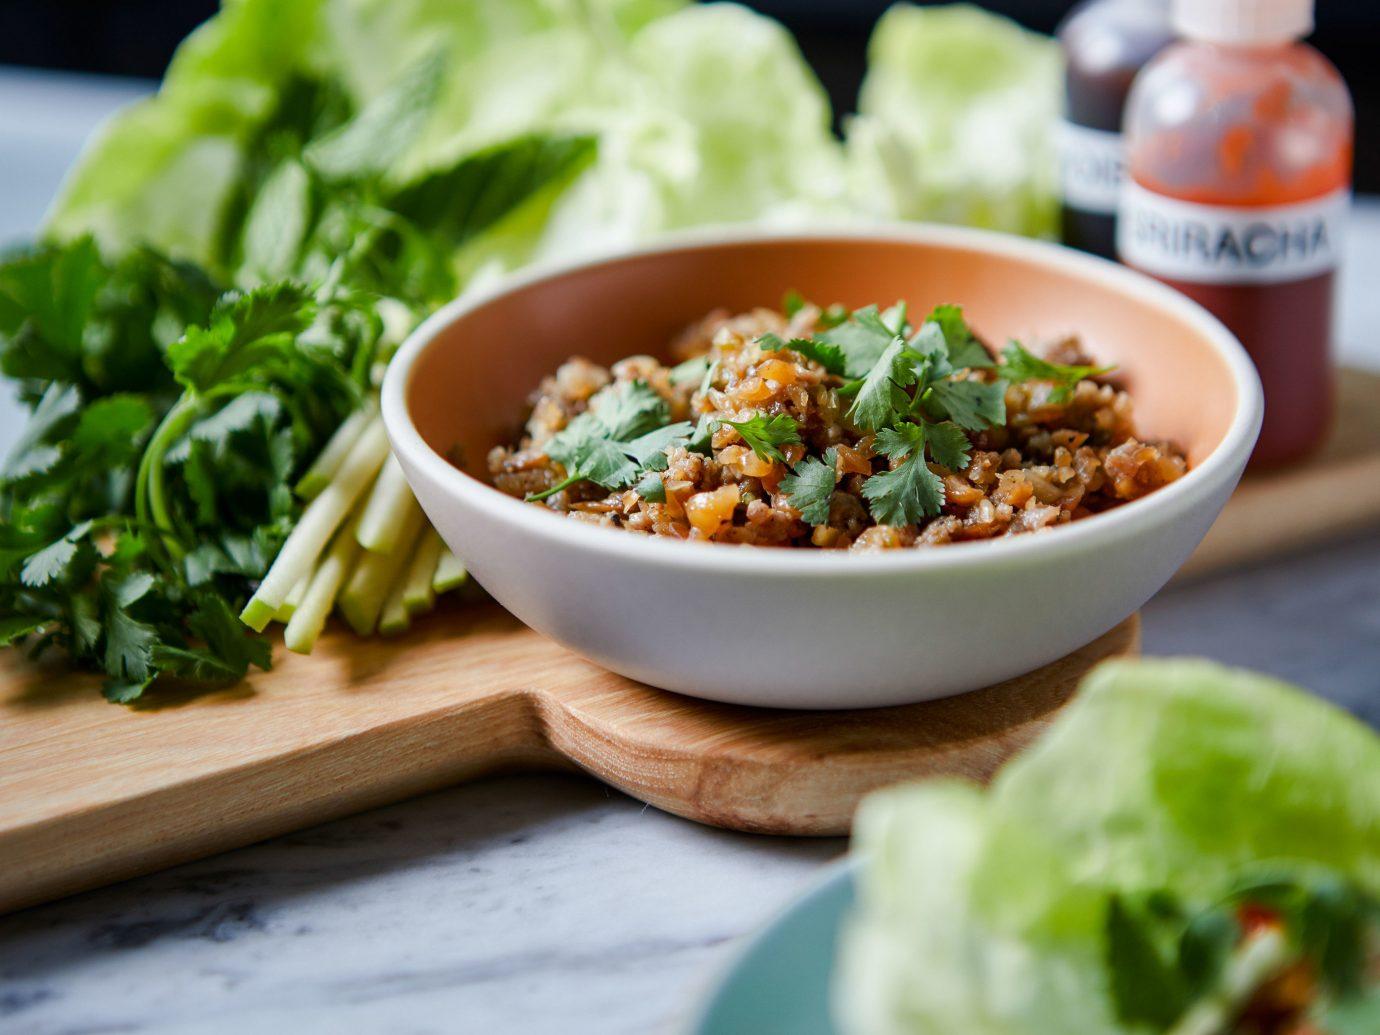 Food + Drink food table dish plate vegetarian food cuisine leaf vegetable salad vegetable asian food condiment recipe thai food dip meal